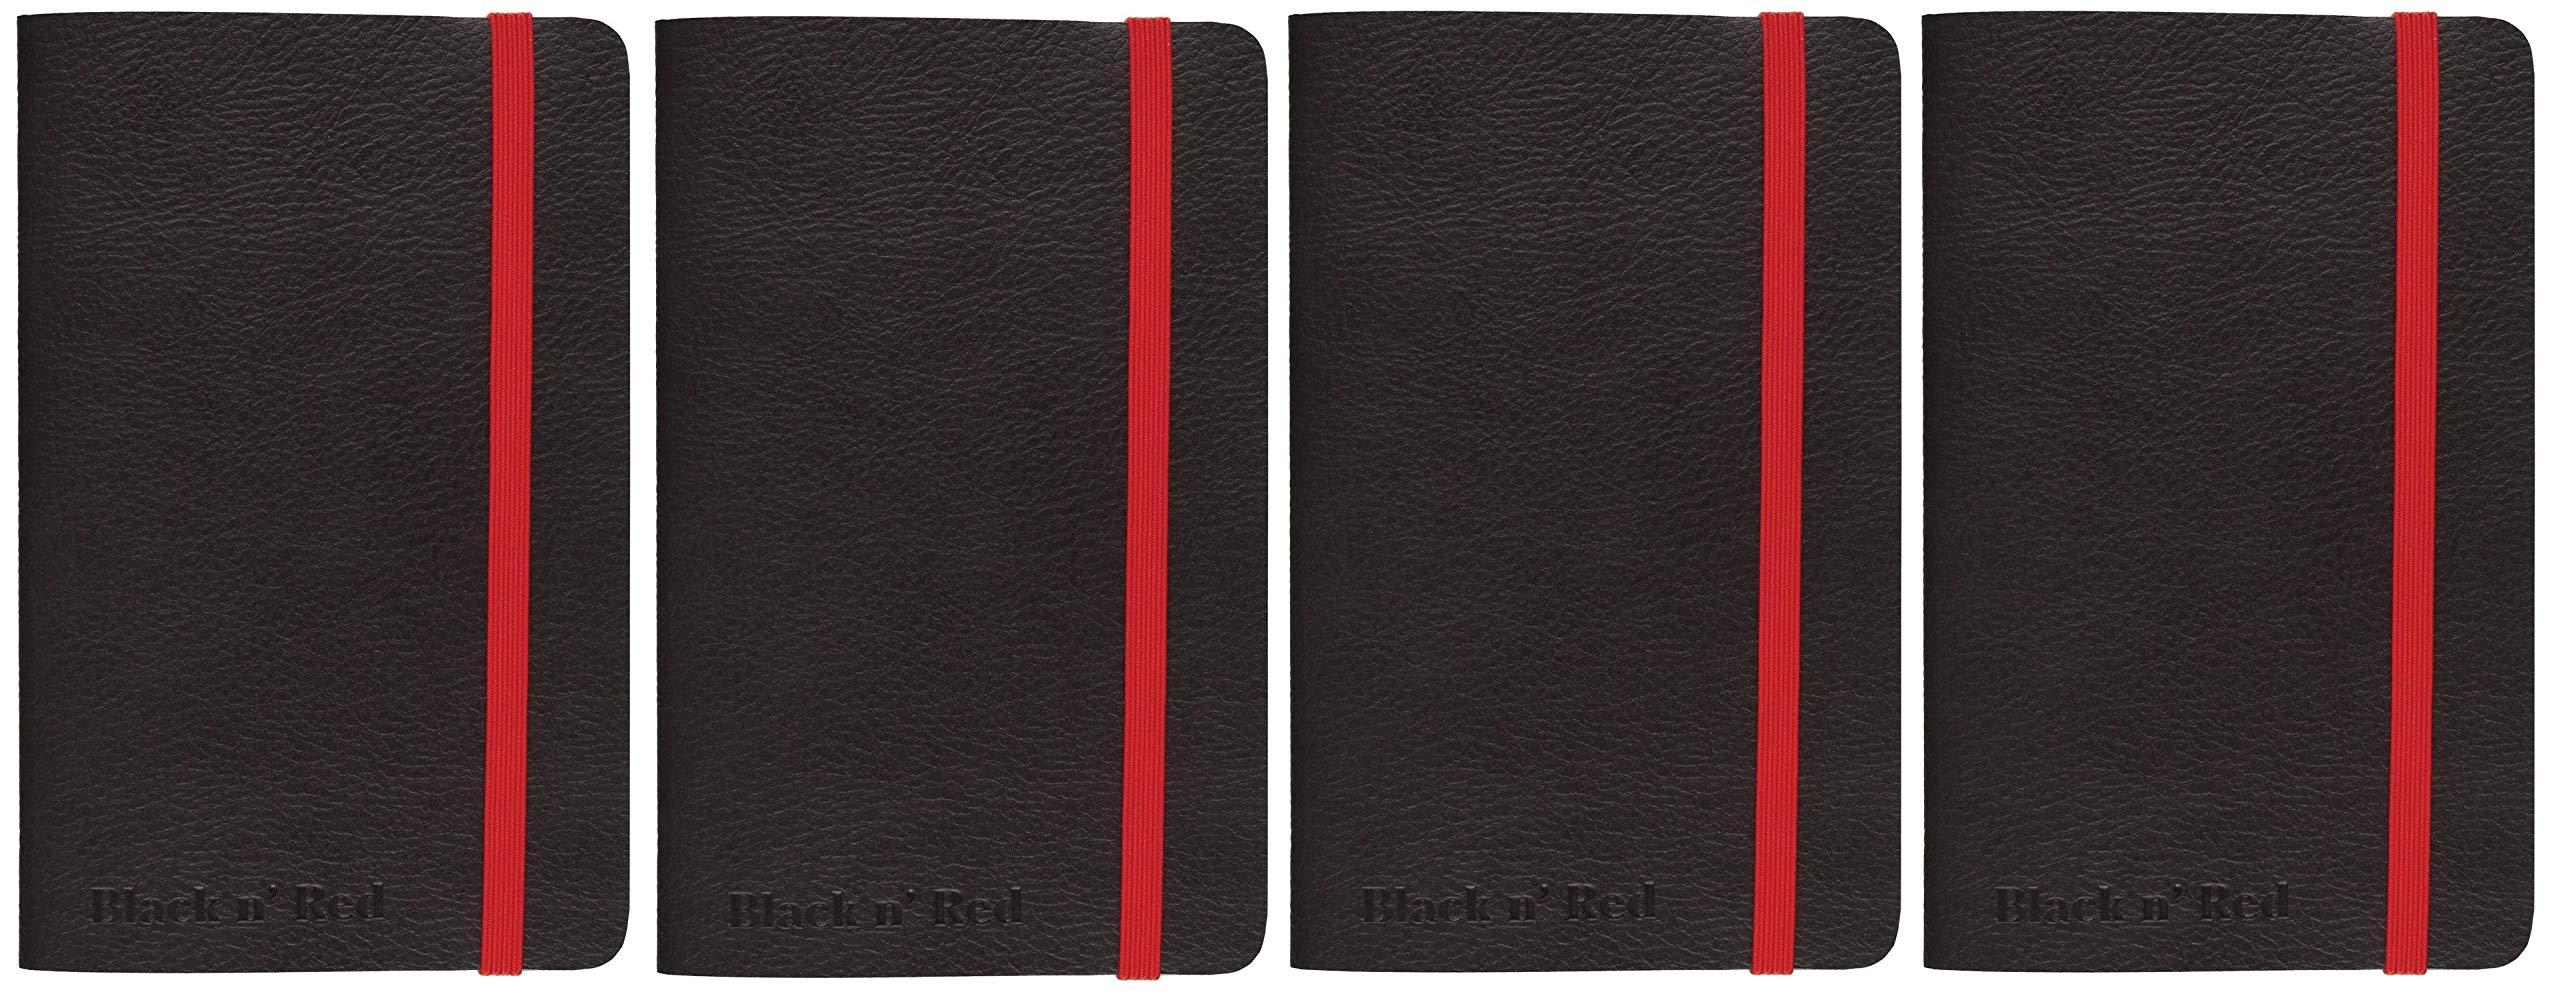 Black n' Red Business Journal, 71 Sheets, 8-1/4 x 5-3/4'', Black (400065000) (Fоur Paсk)